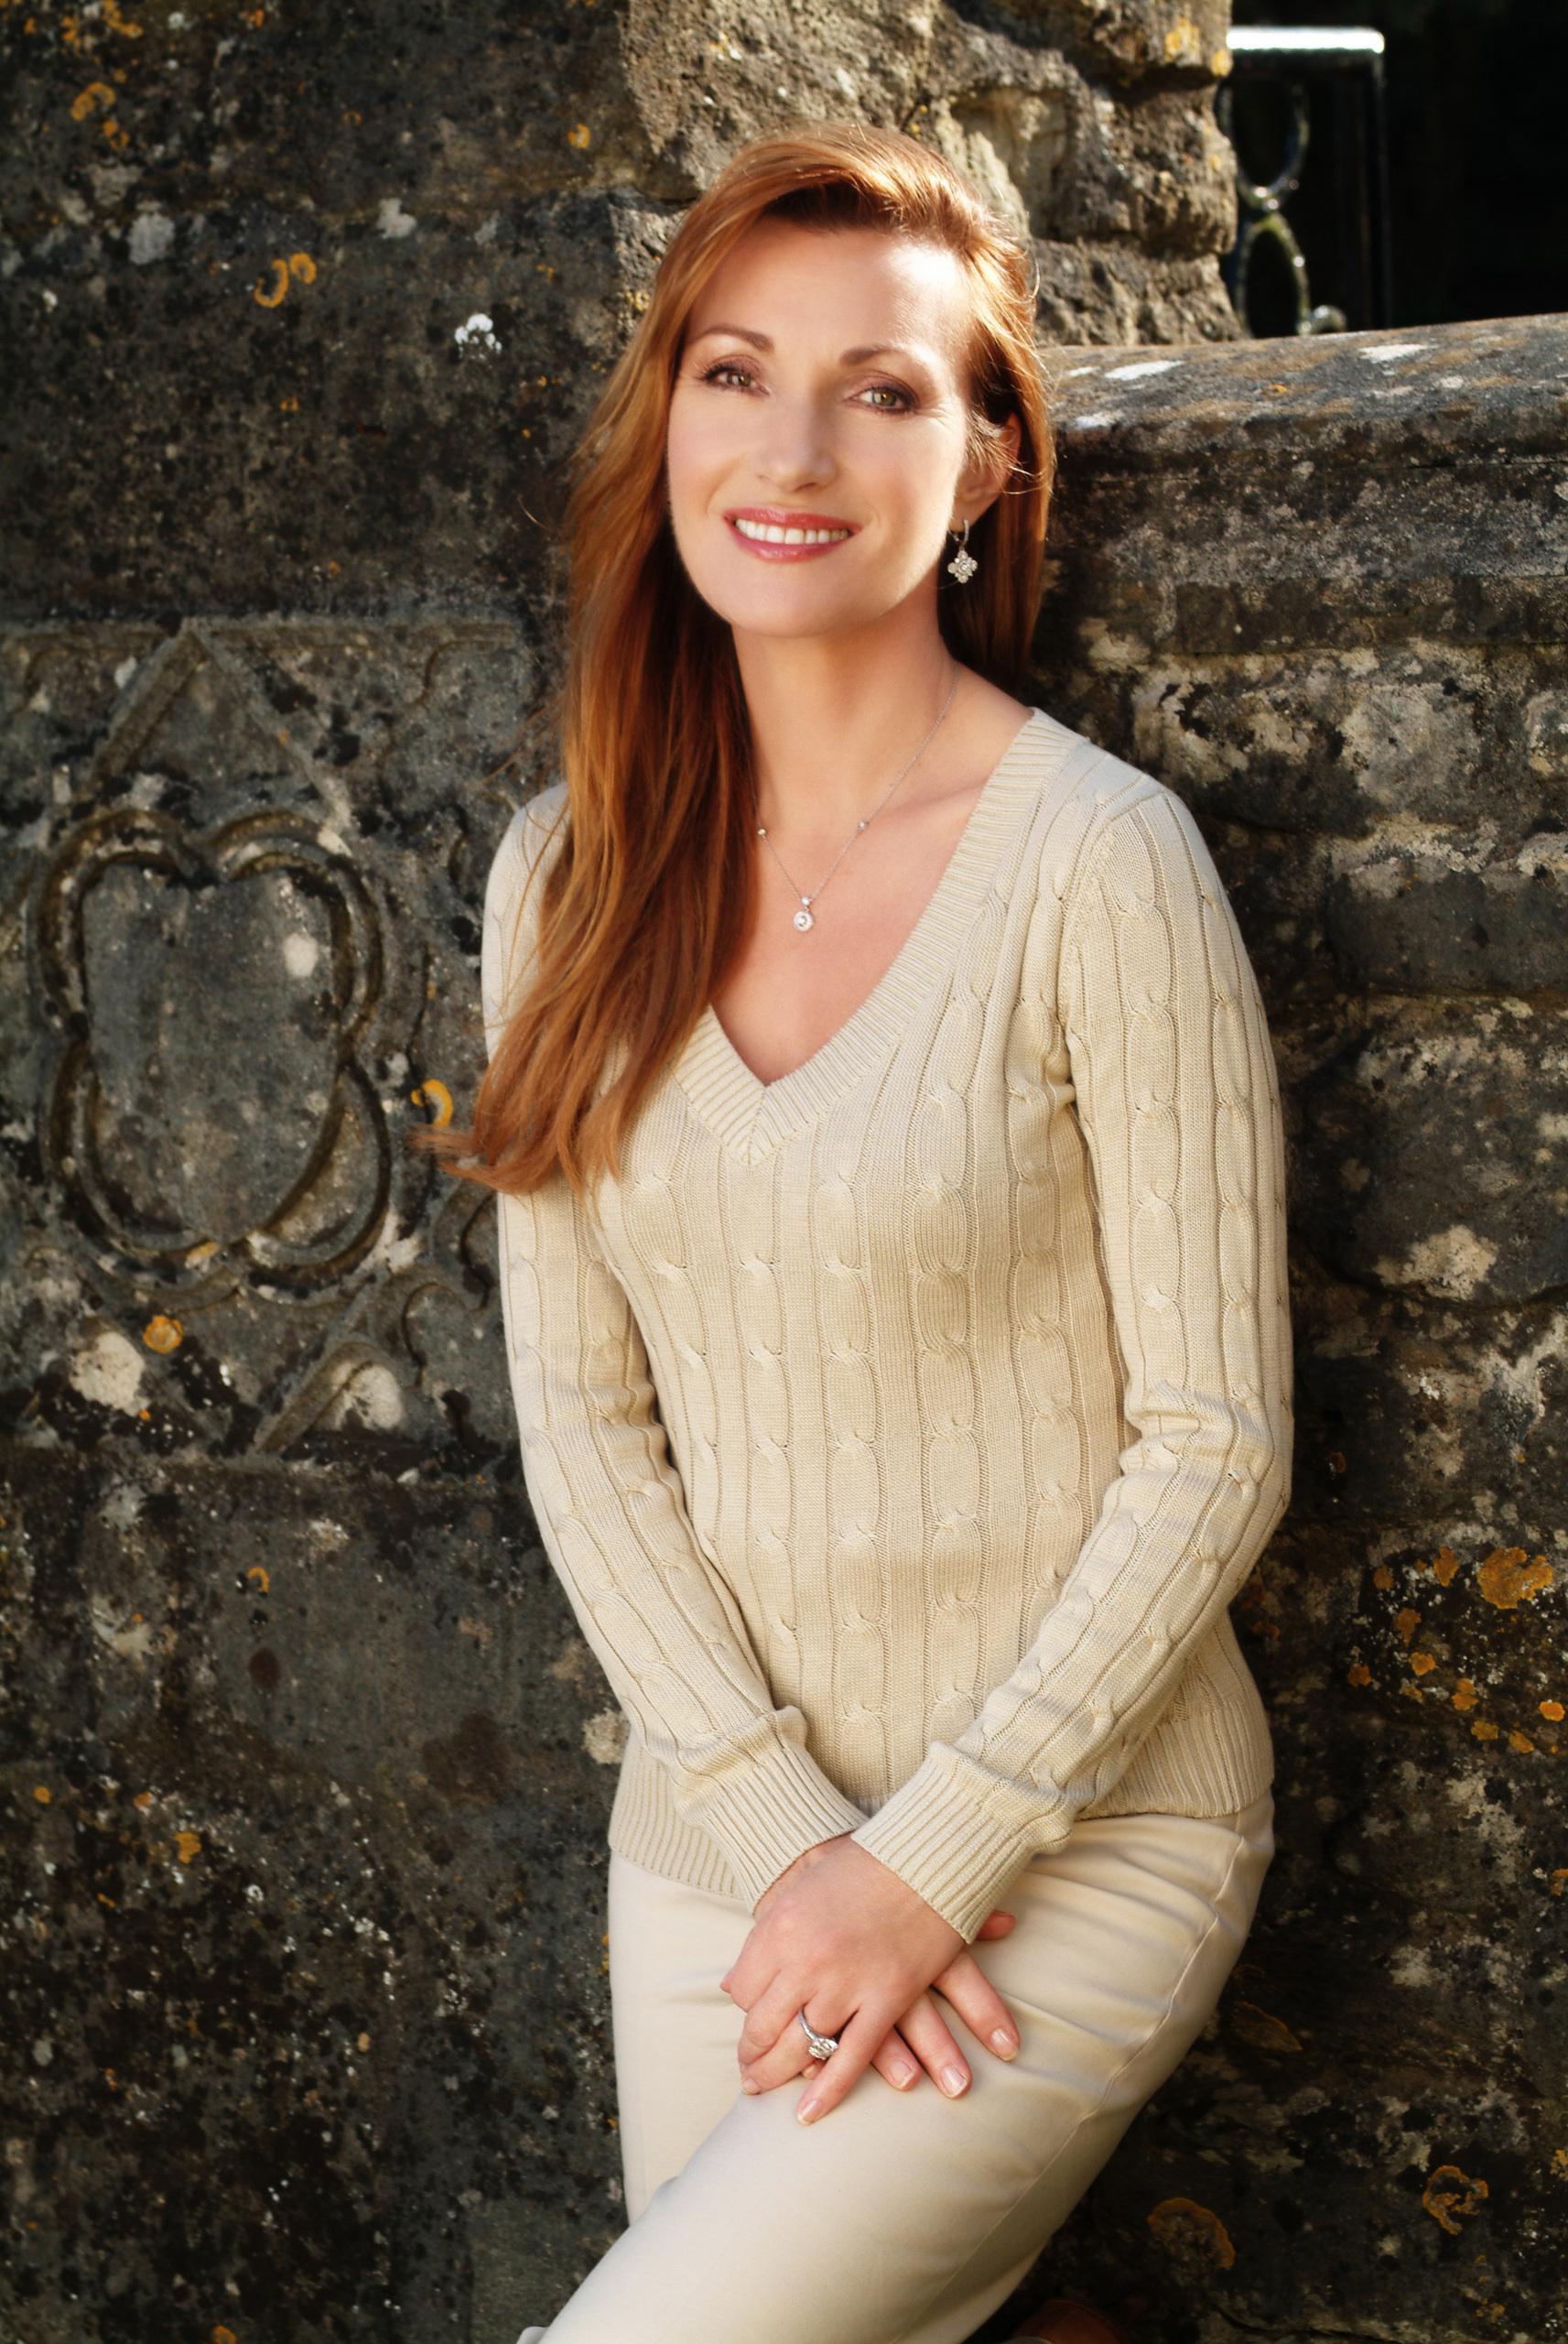 Jane Seymour Jane Seymour Photo 26078104 Fanpop